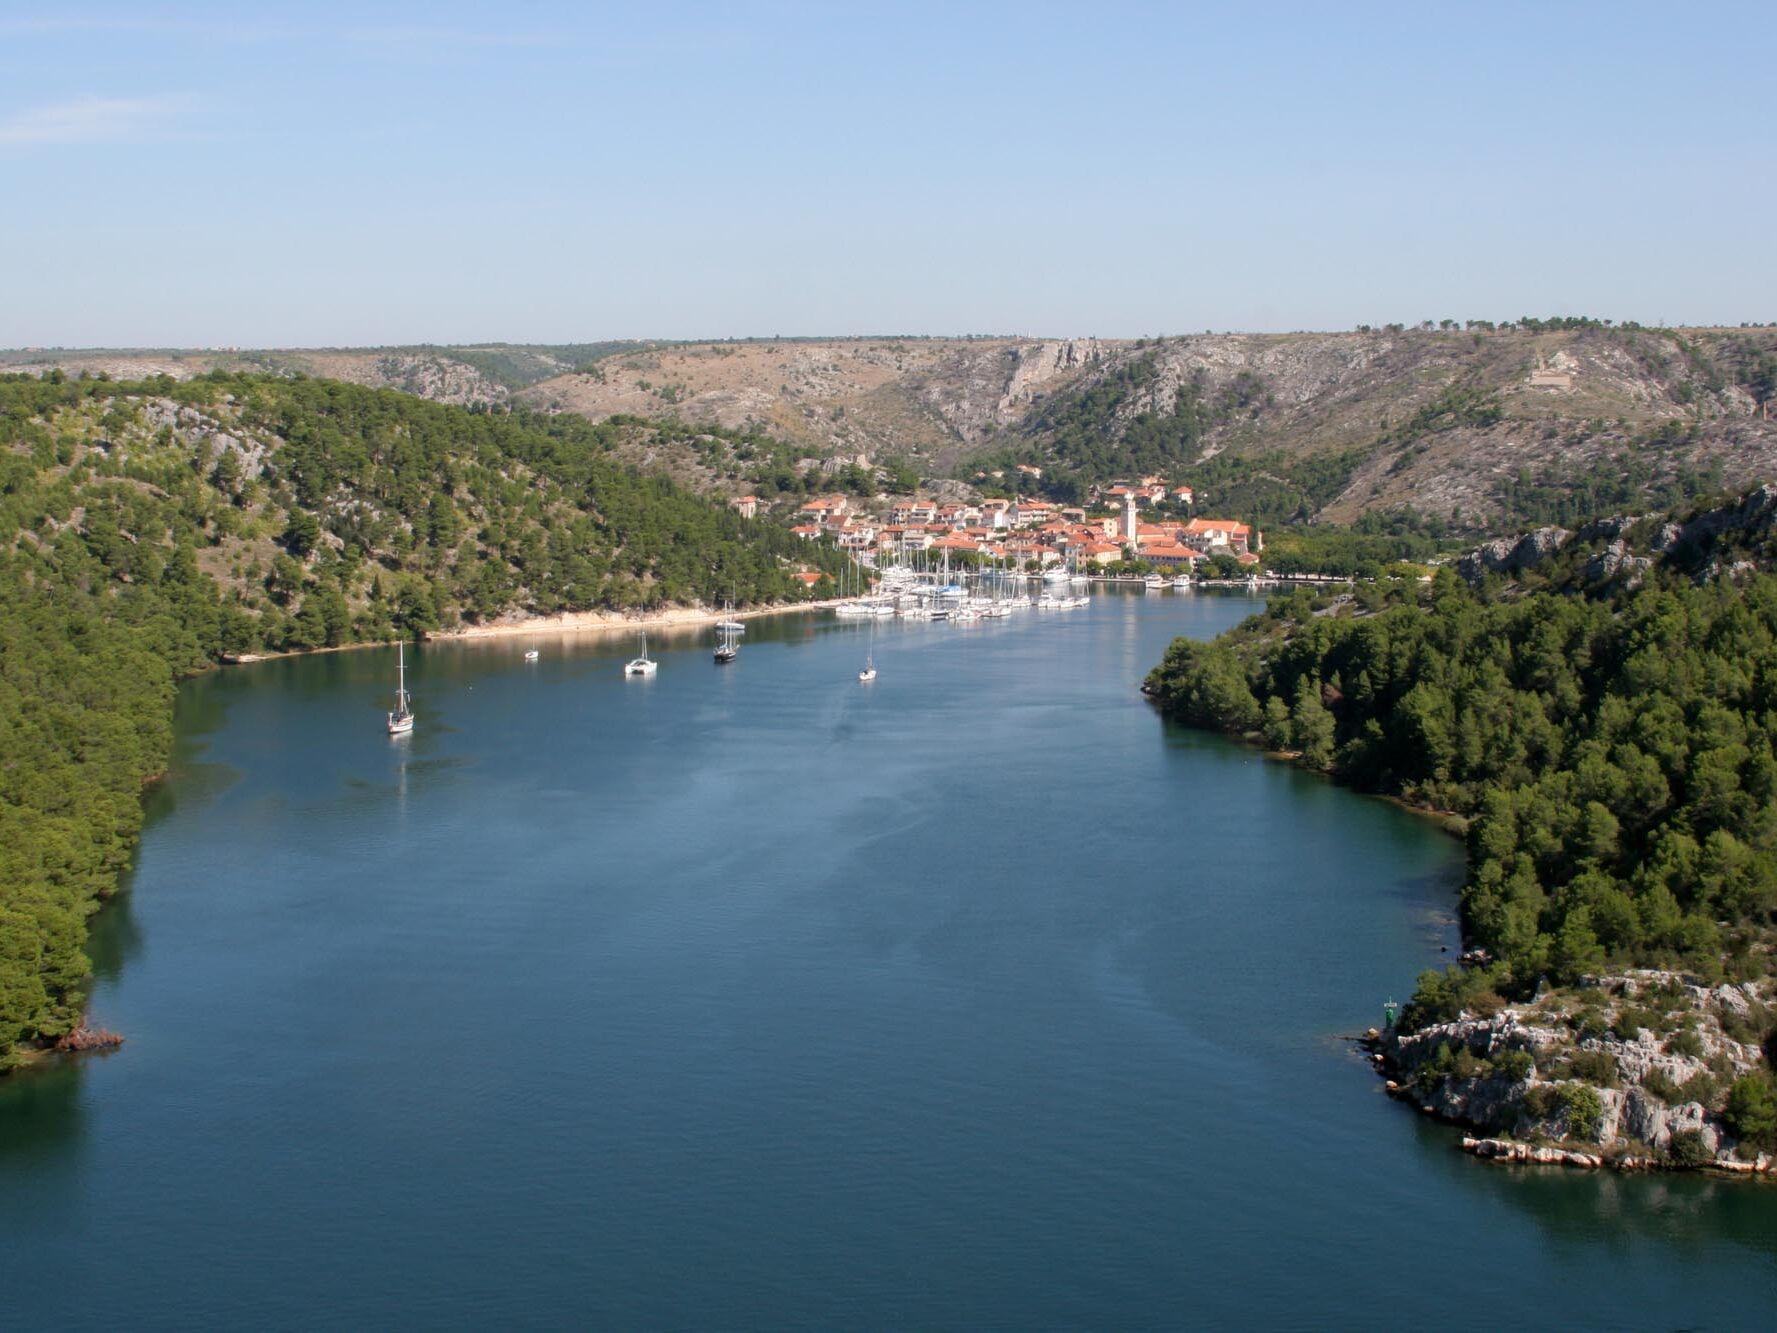 Krka National Park Skradin town Croatia